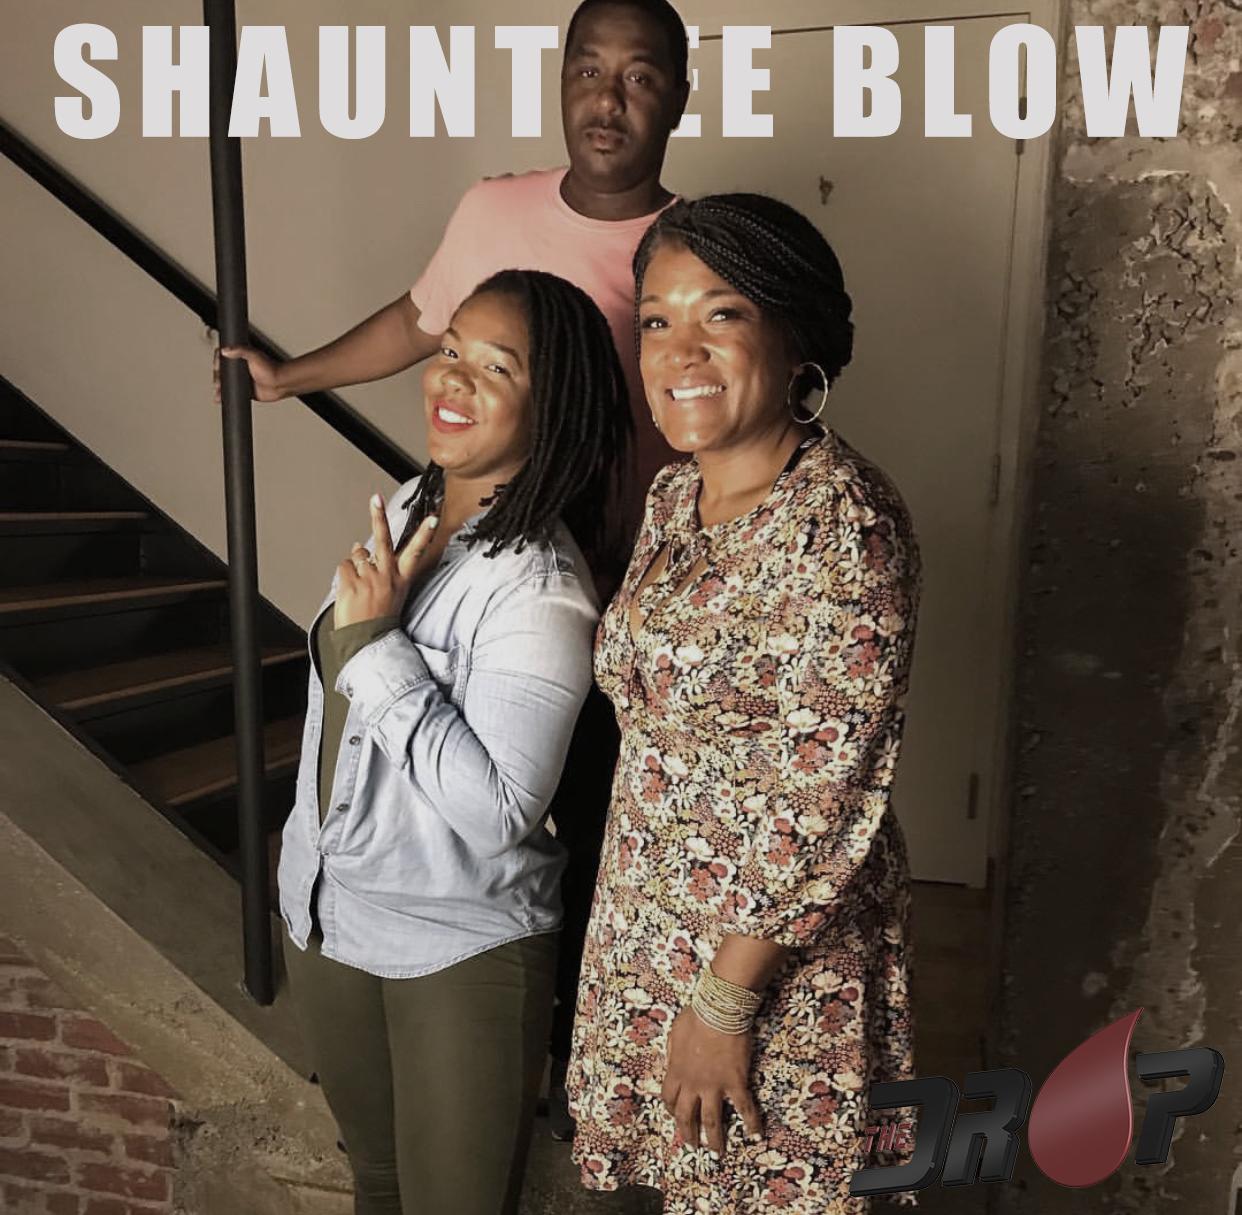 shauntee blow interview